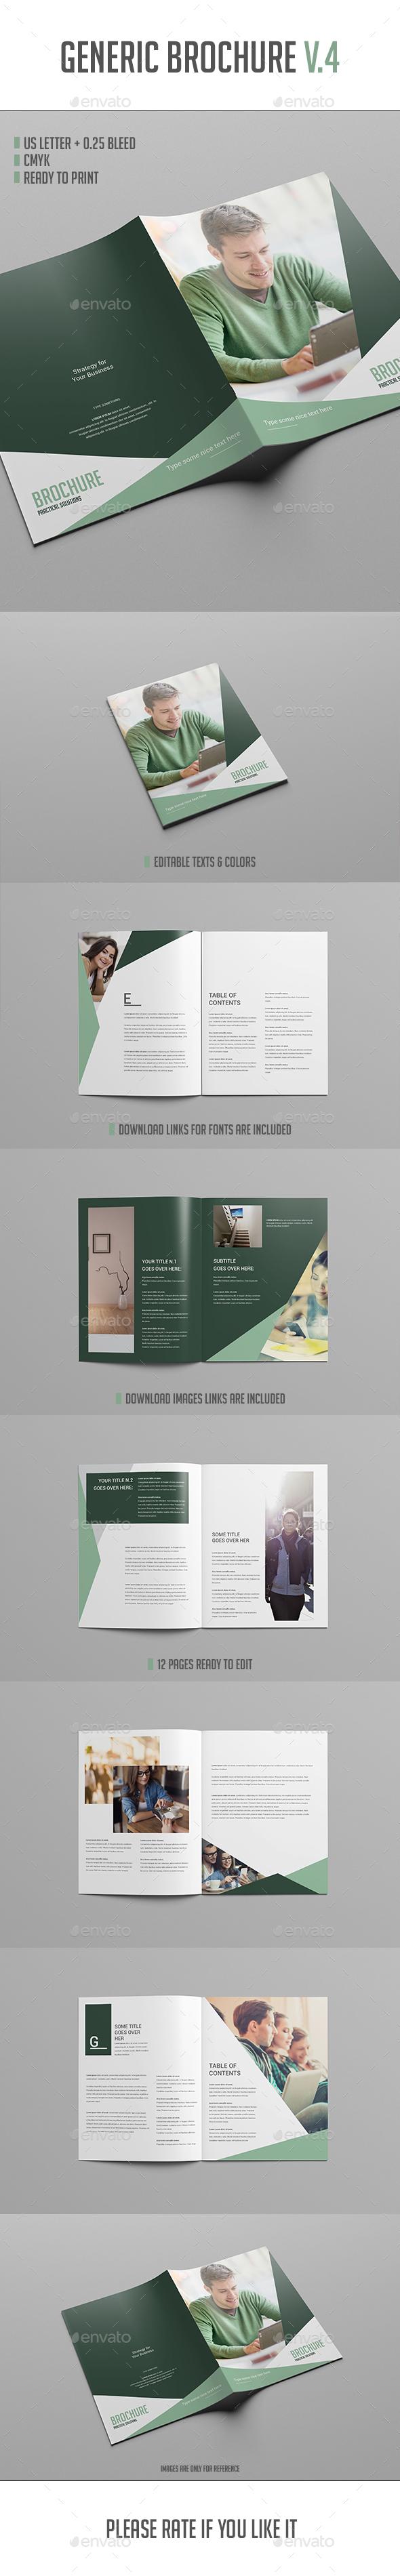 Brochure Template Vol.4 - Brochures Print